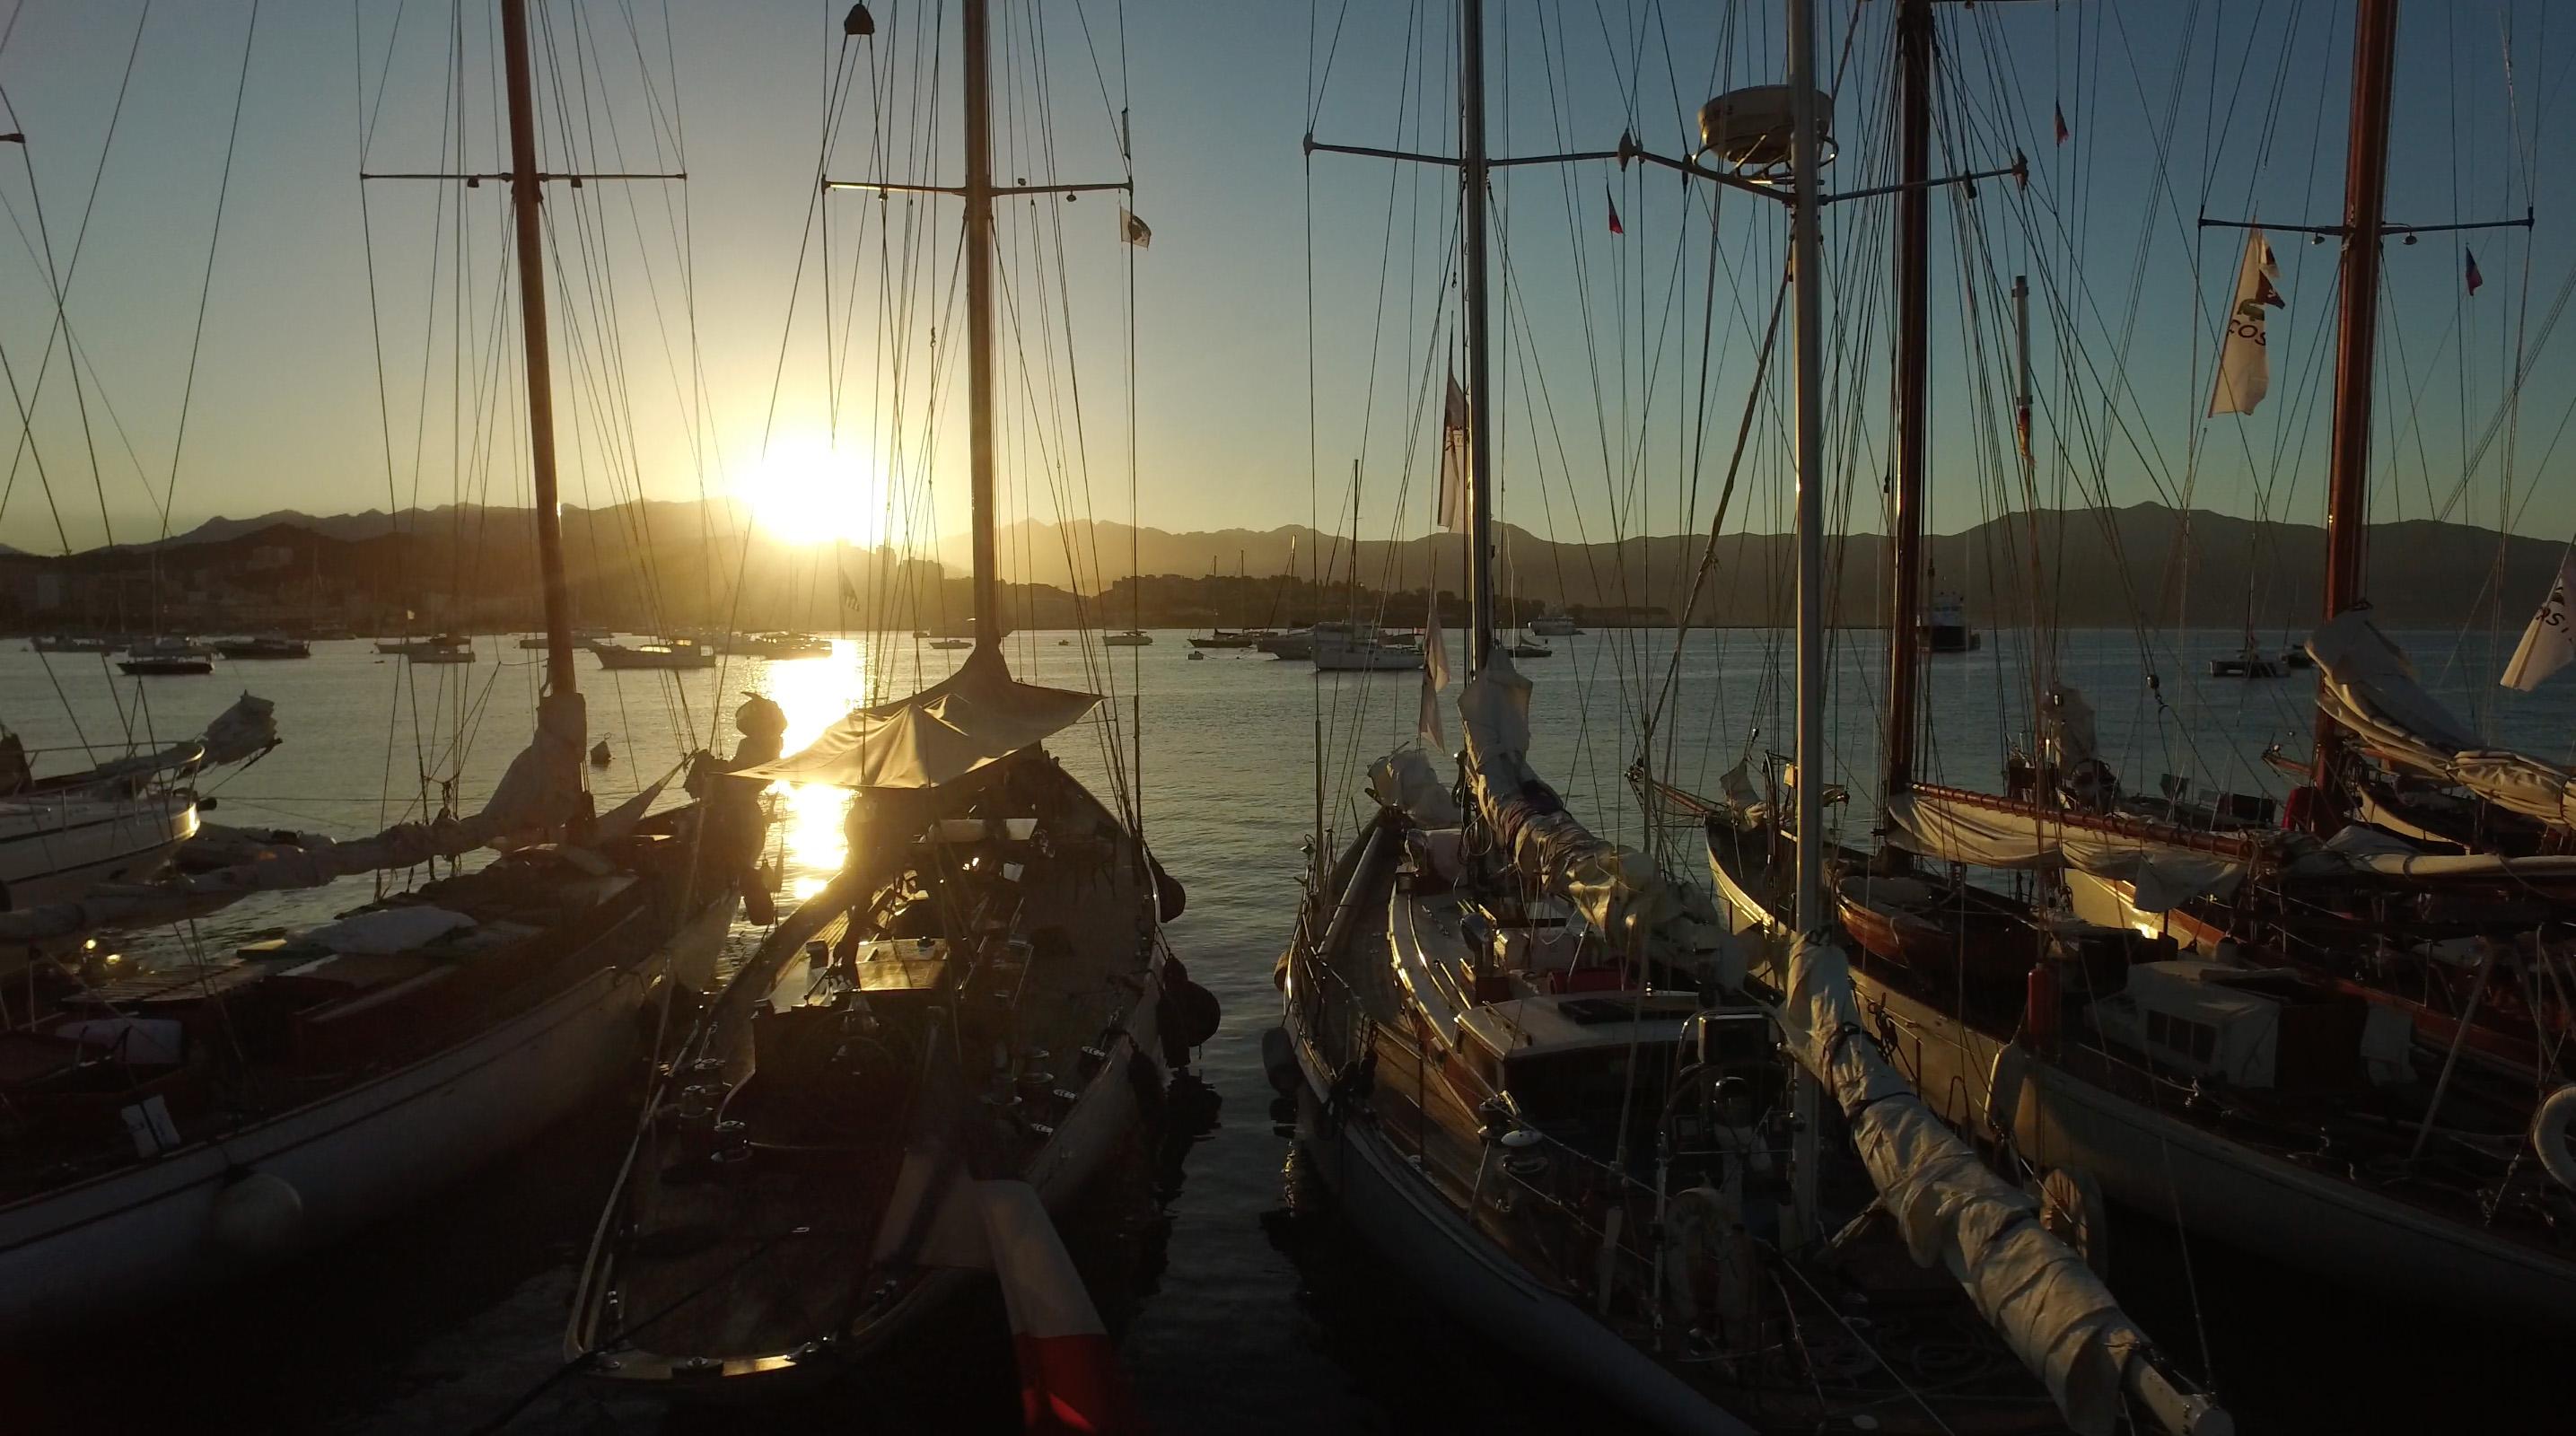 Port Charles Ornano Ajaccio Photo Emmanuel Kirch